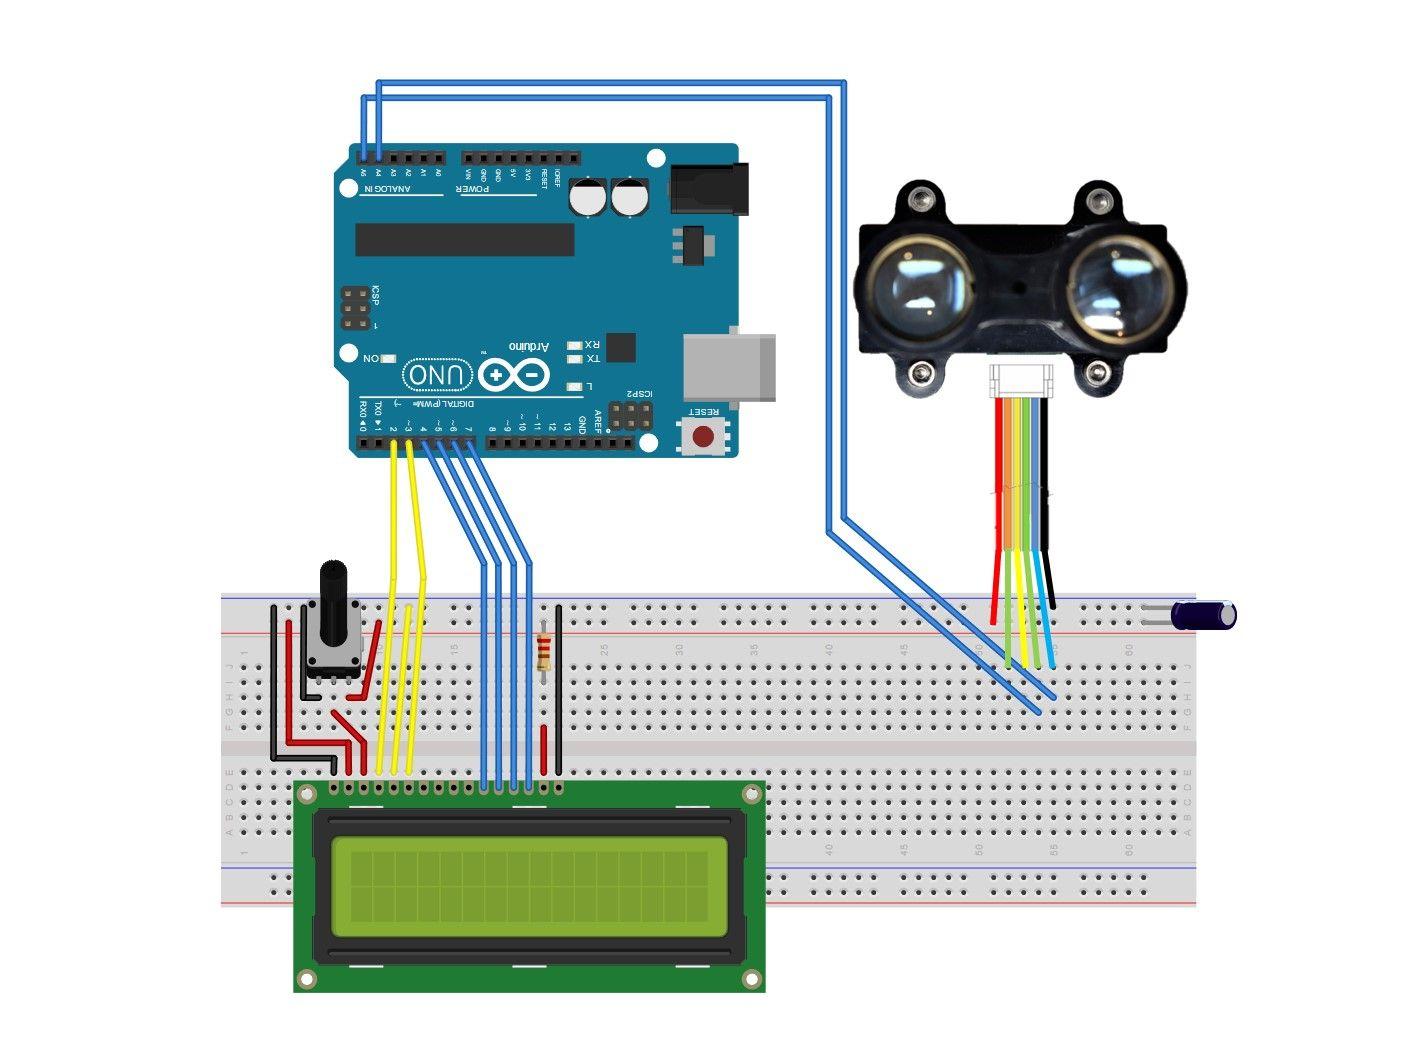 Circuit schematic p13 v2 dz7squzhao